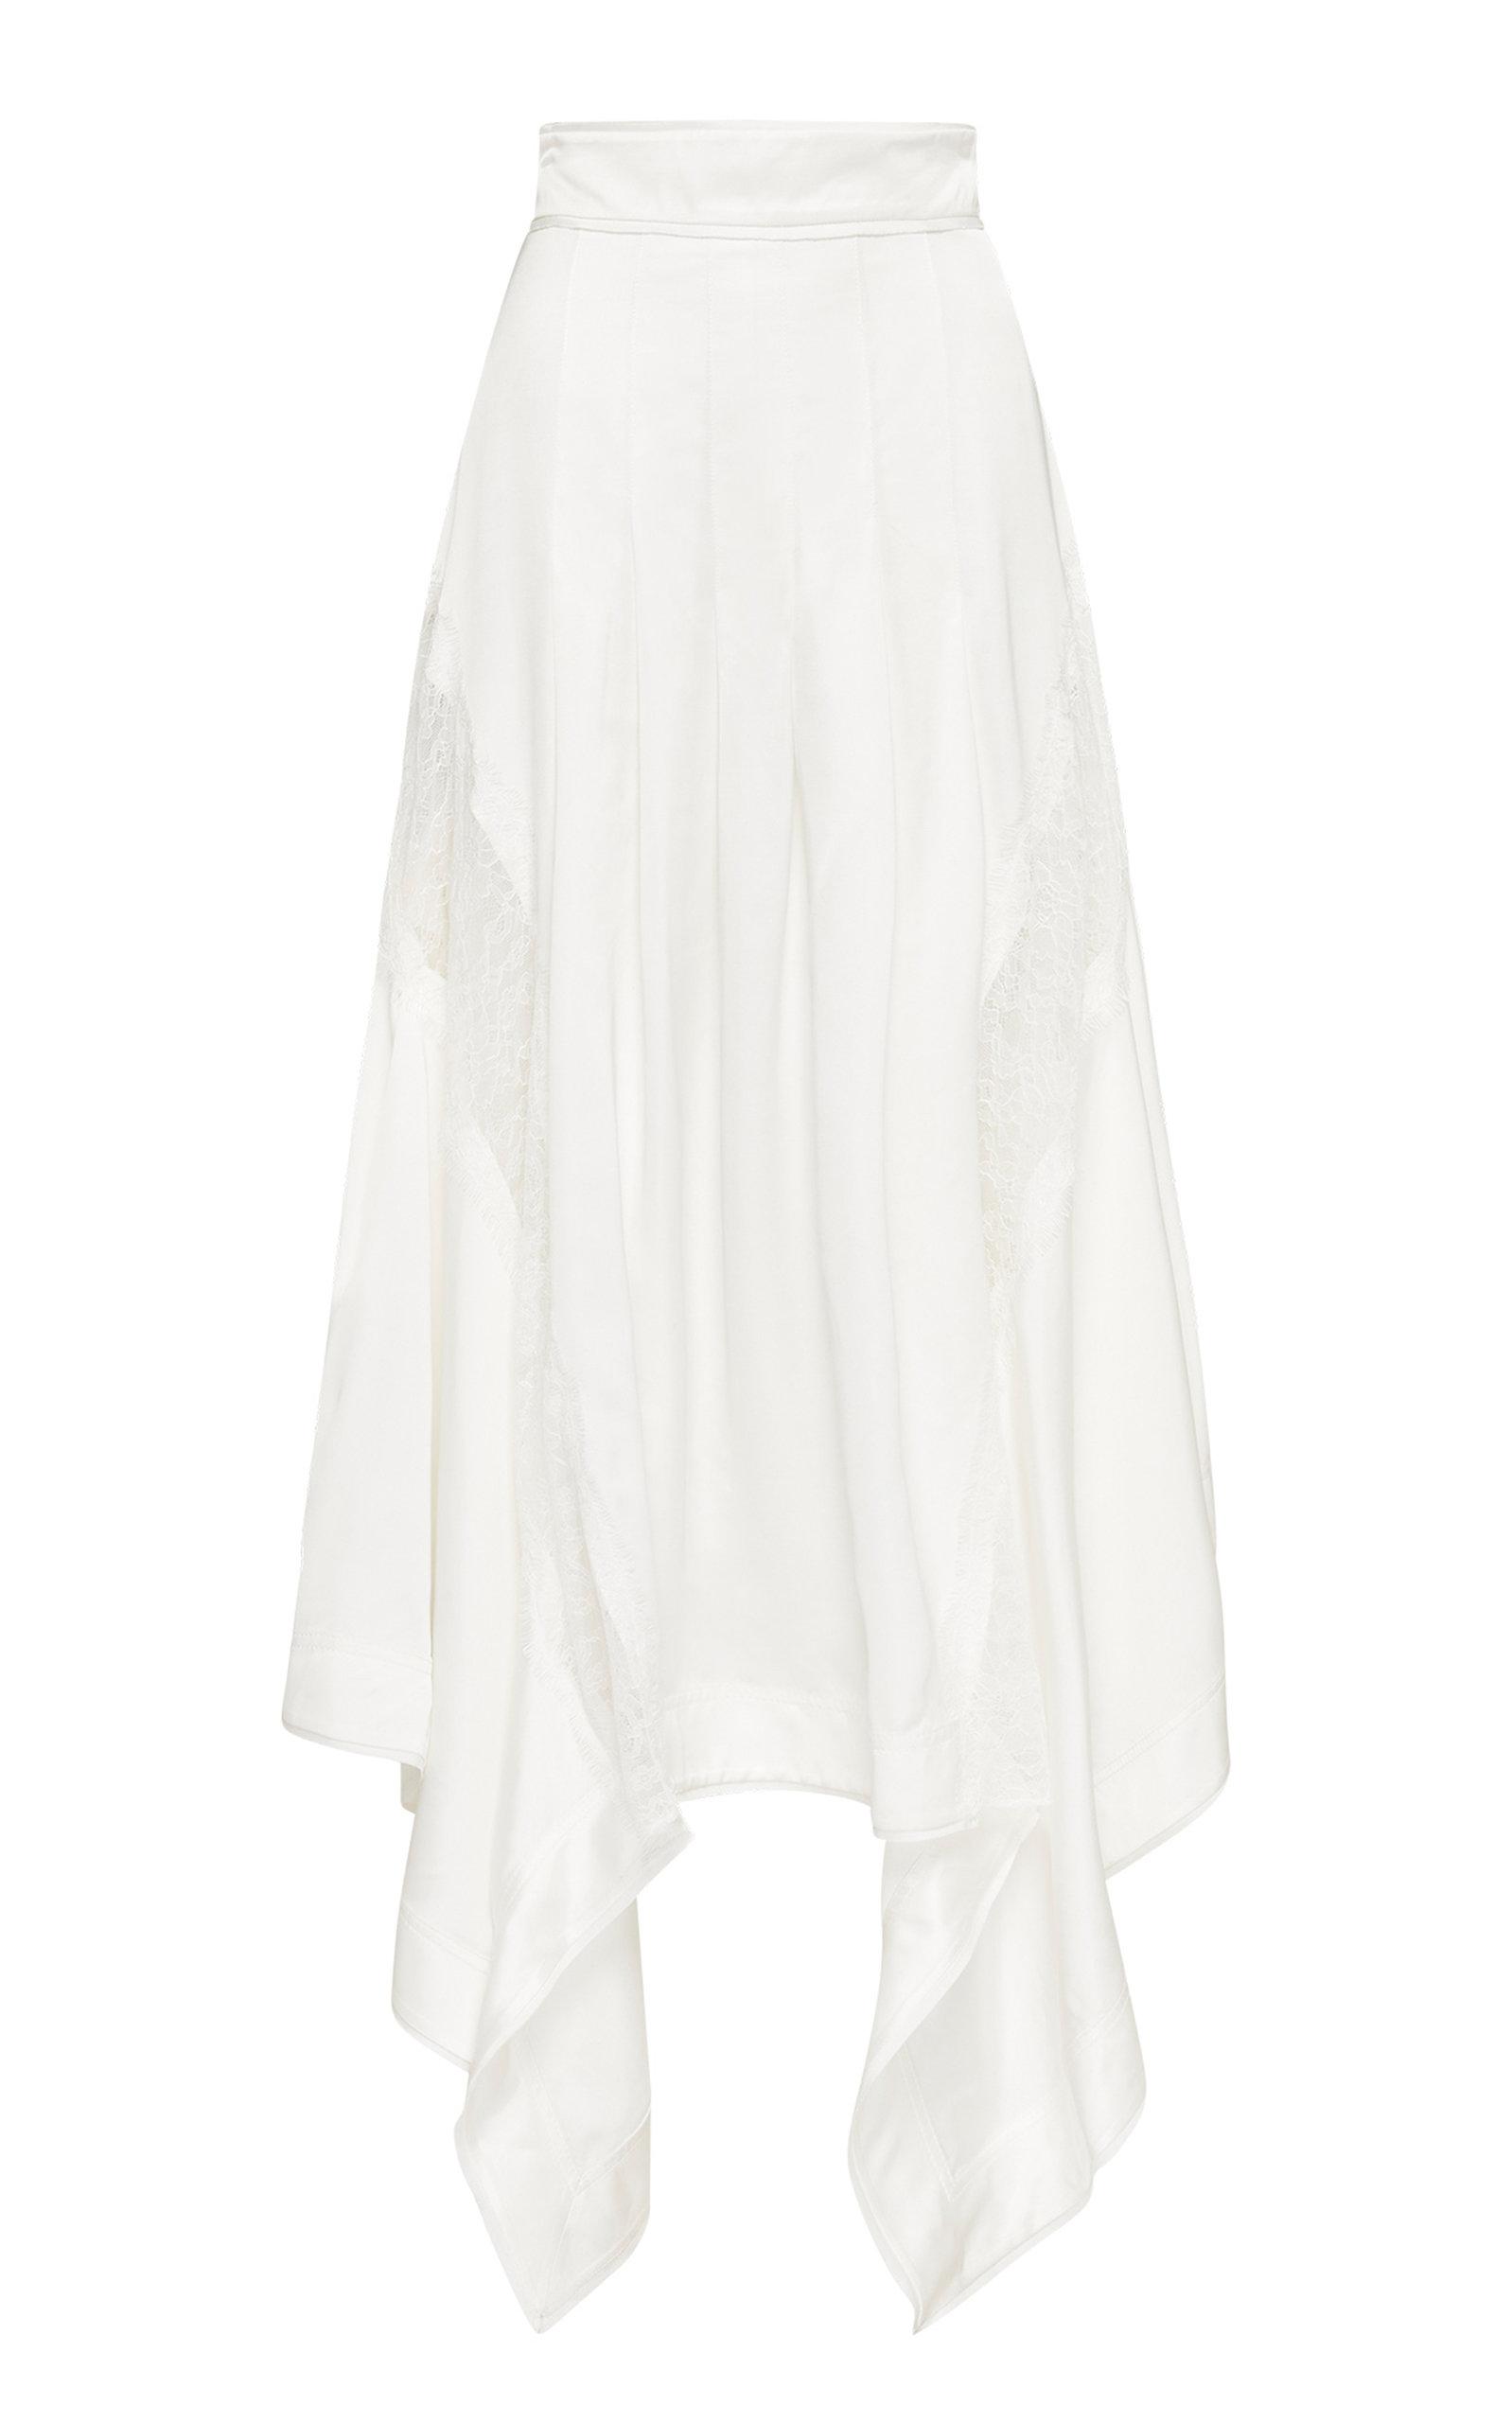 - Women's Veil Lace-Trimmed Crepe Handkerchief Skirt